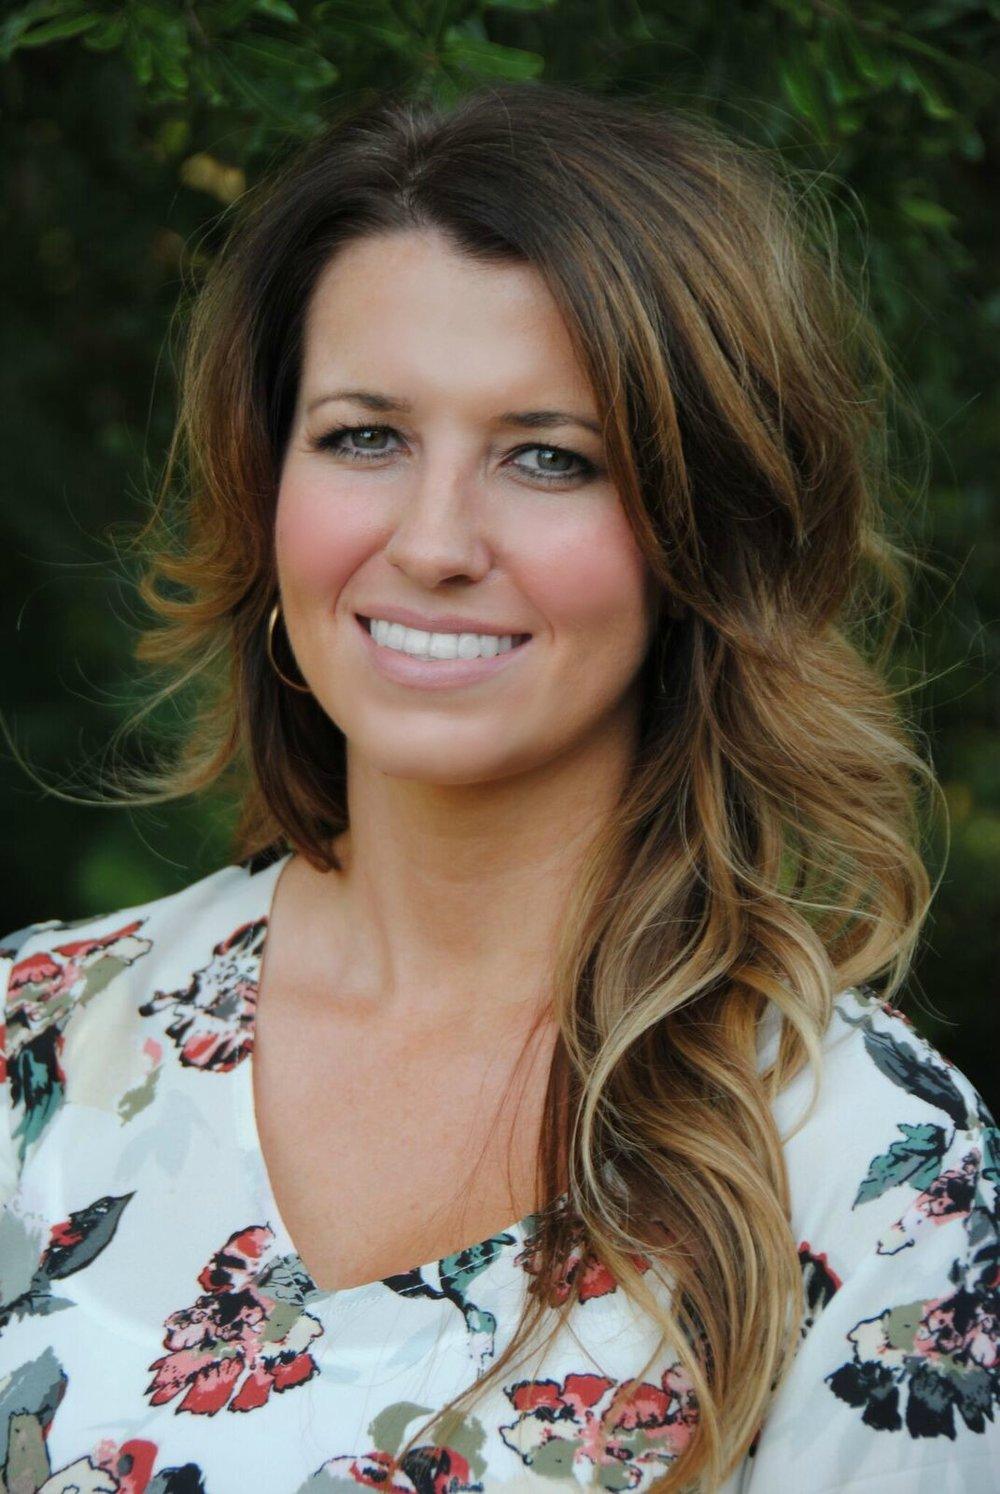 Katie Sponberger, North Georgia Program Manager